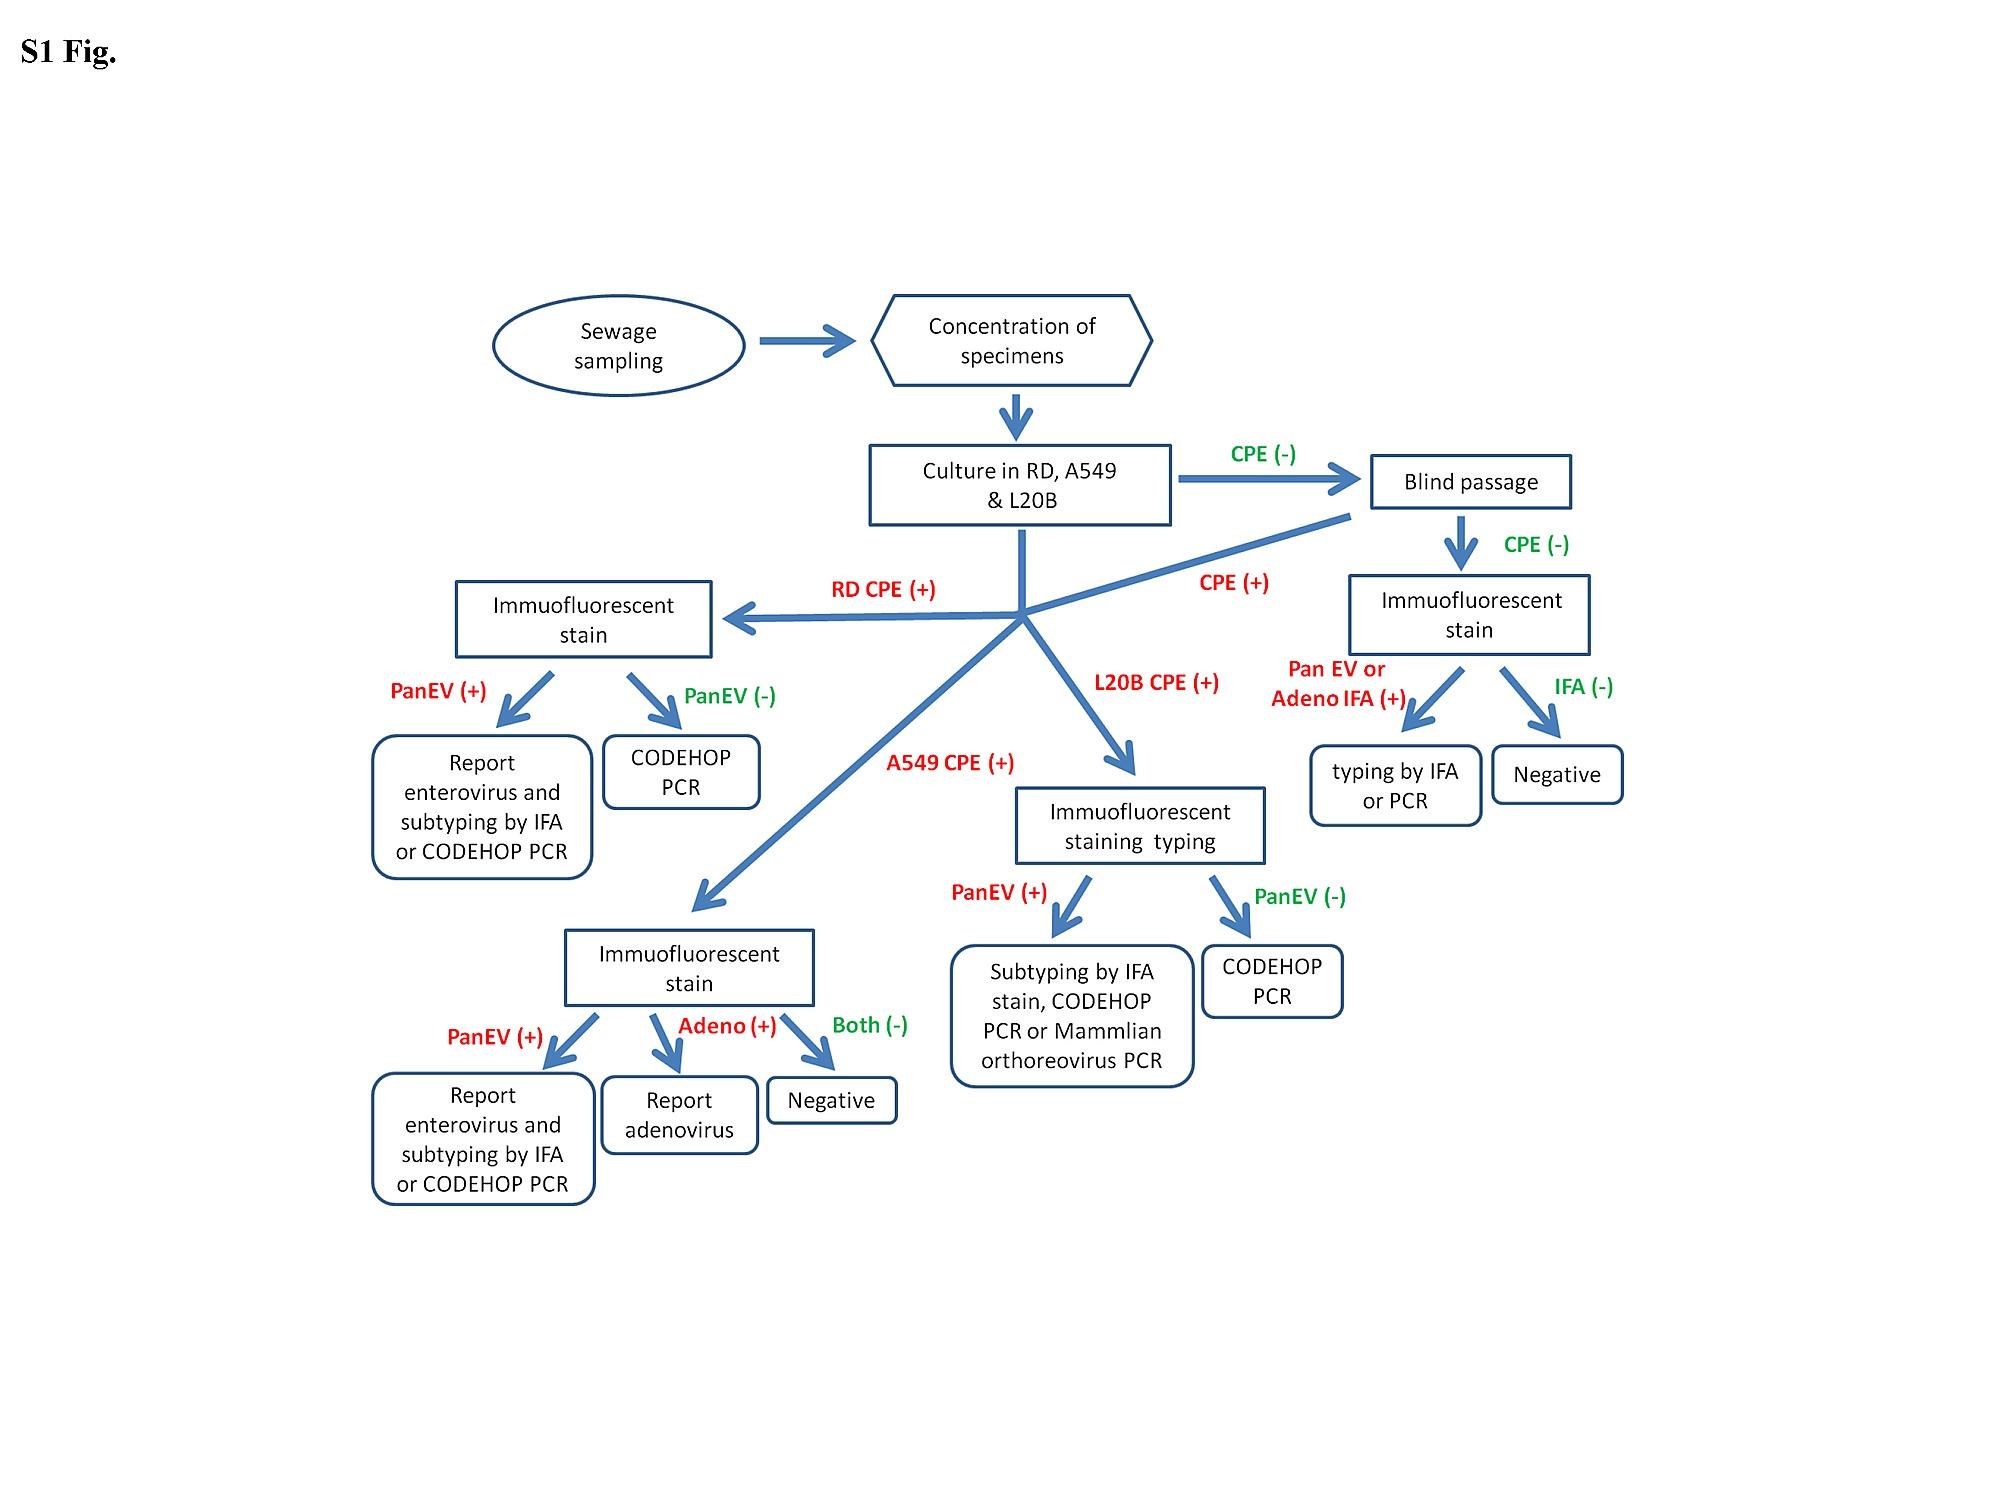 High incidence of mammalian orthoreovirus identified by the flow chart of the virus isolation and identification nvjuhfo Gallery